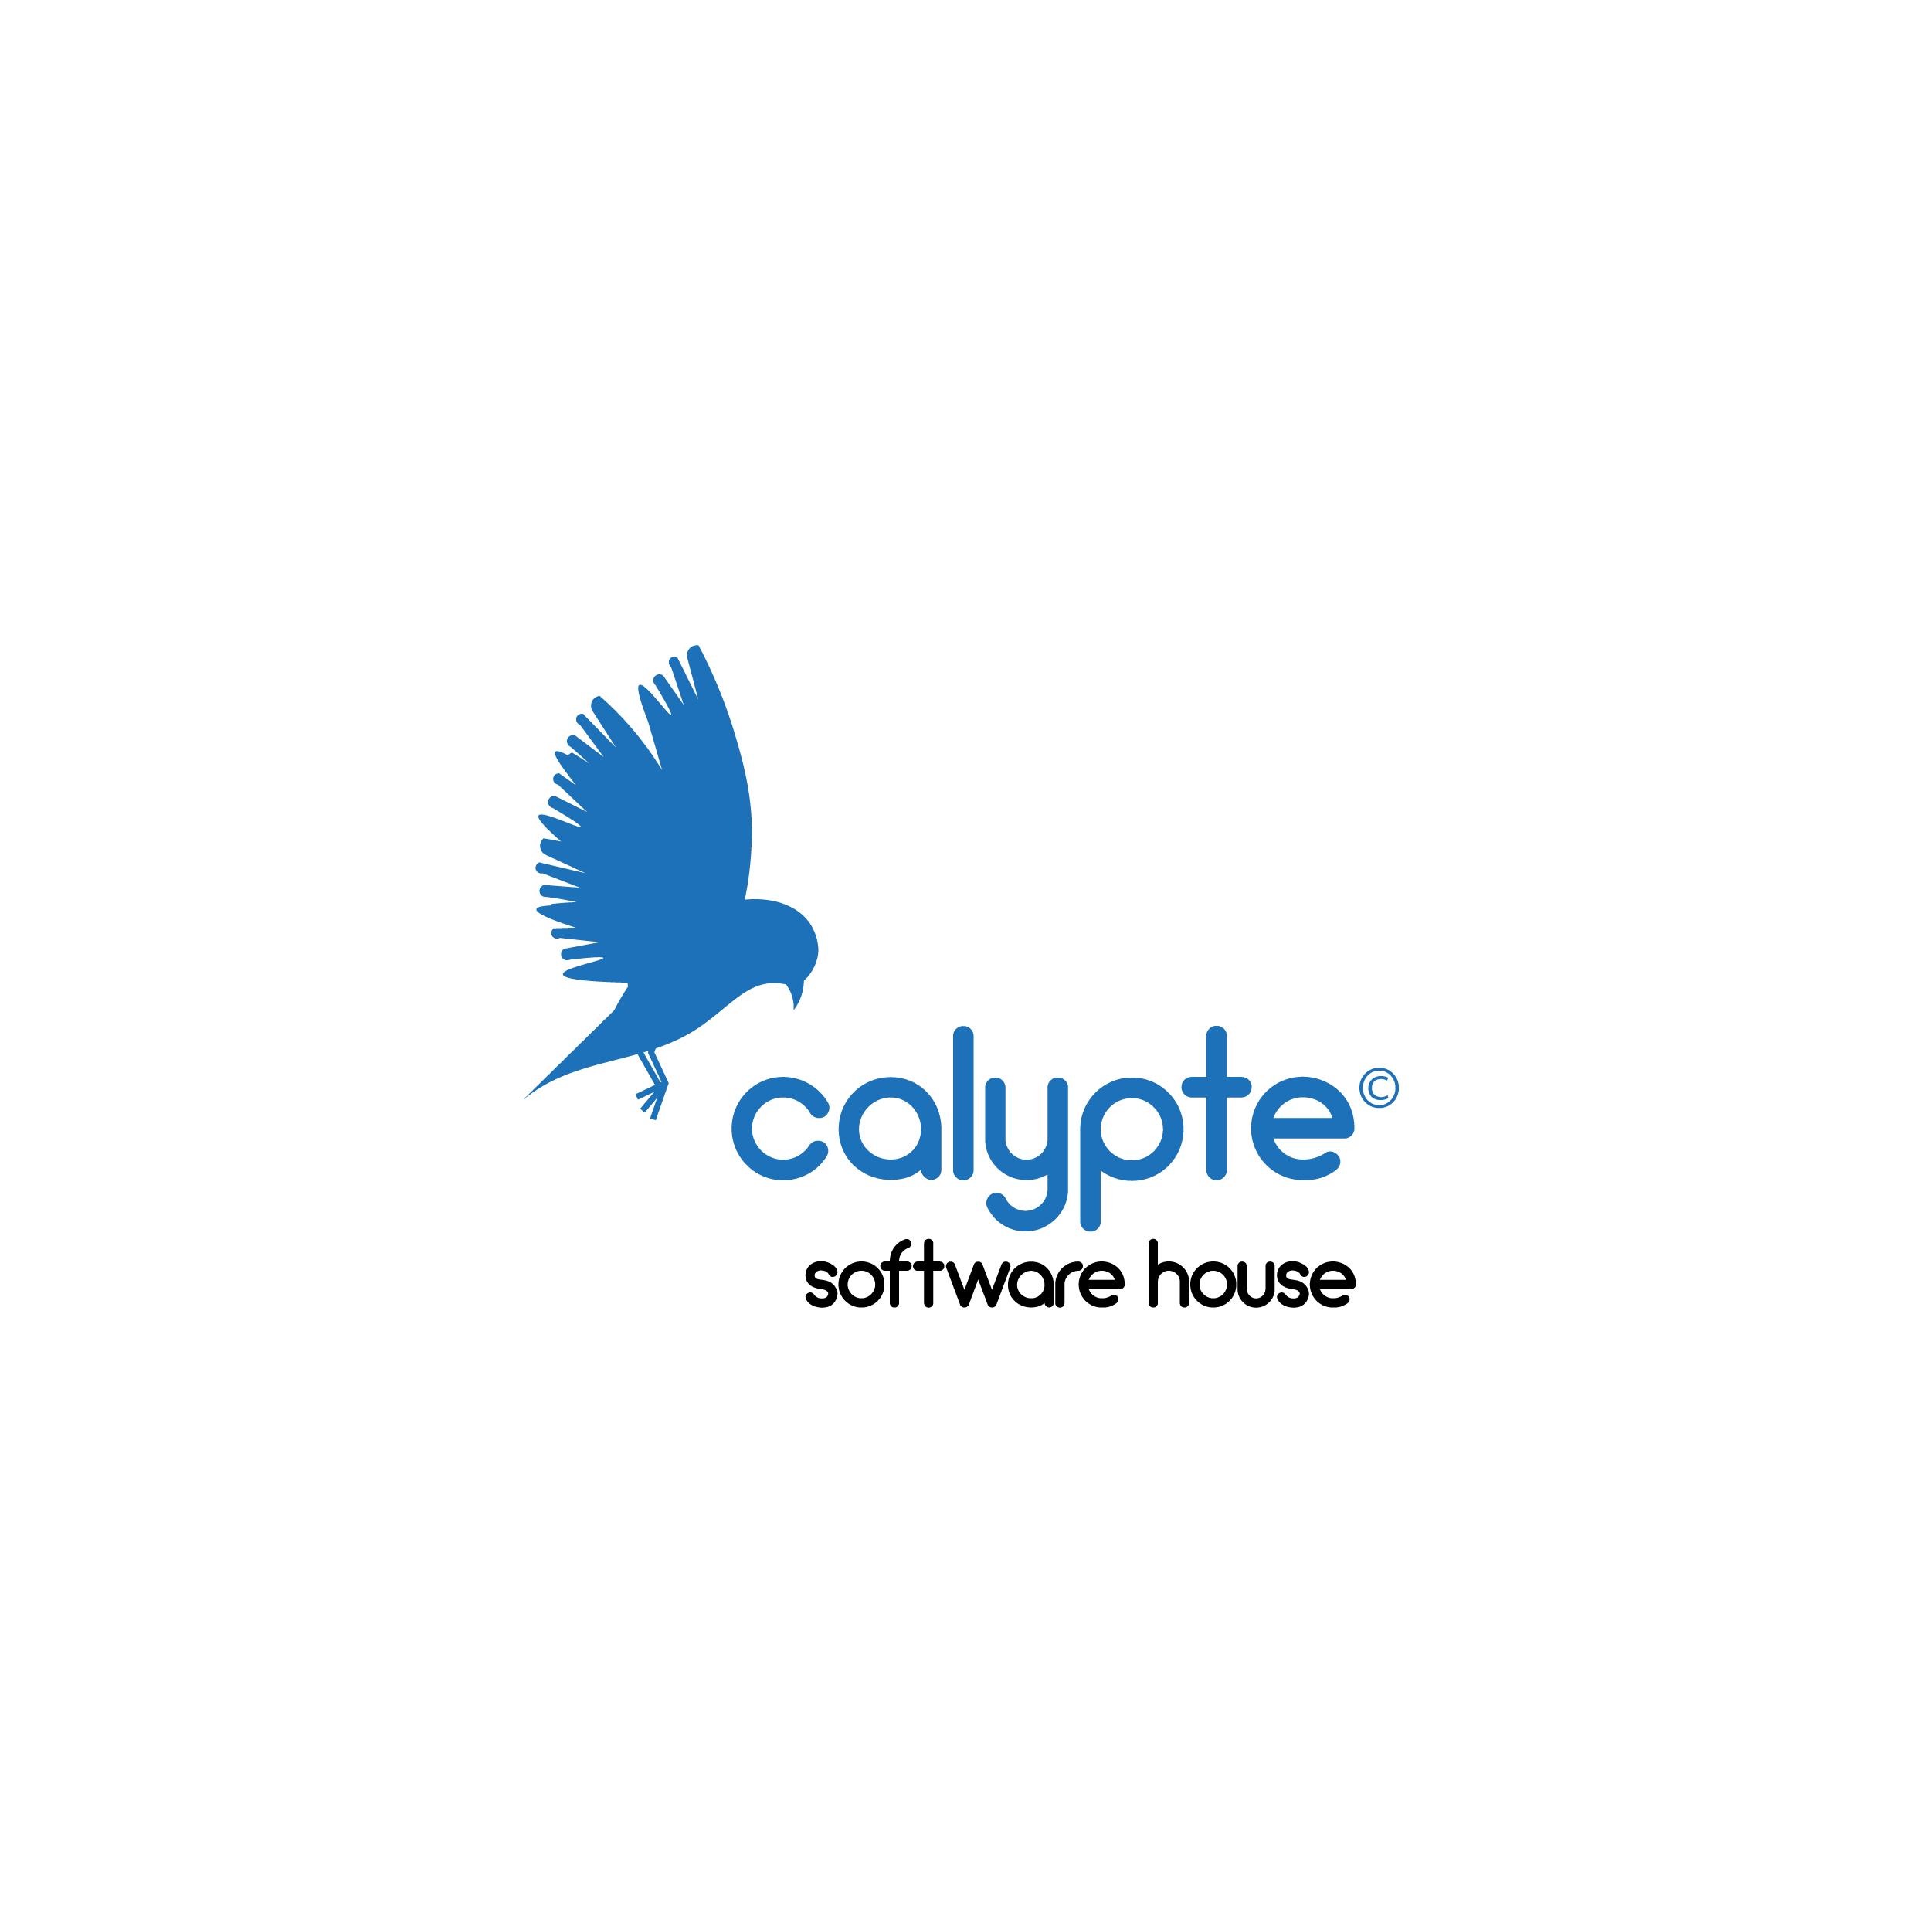 LogoFolio - Calypte-01